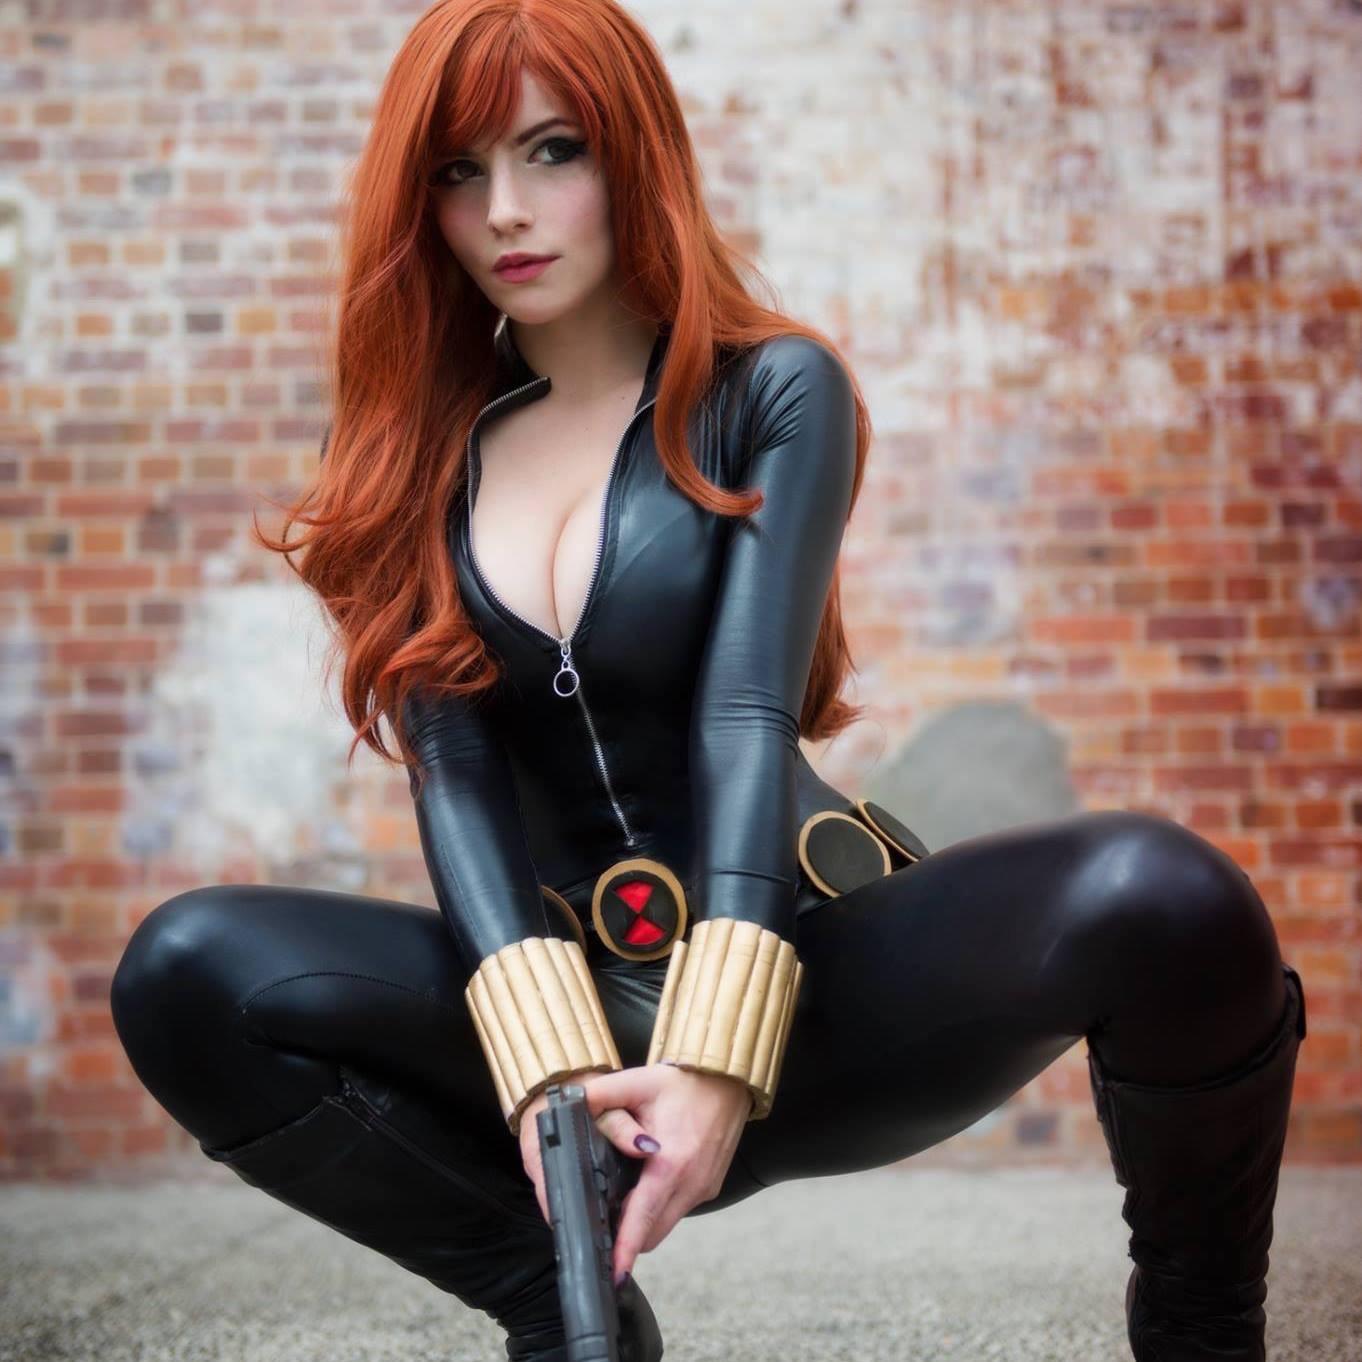 cosplay cam sex